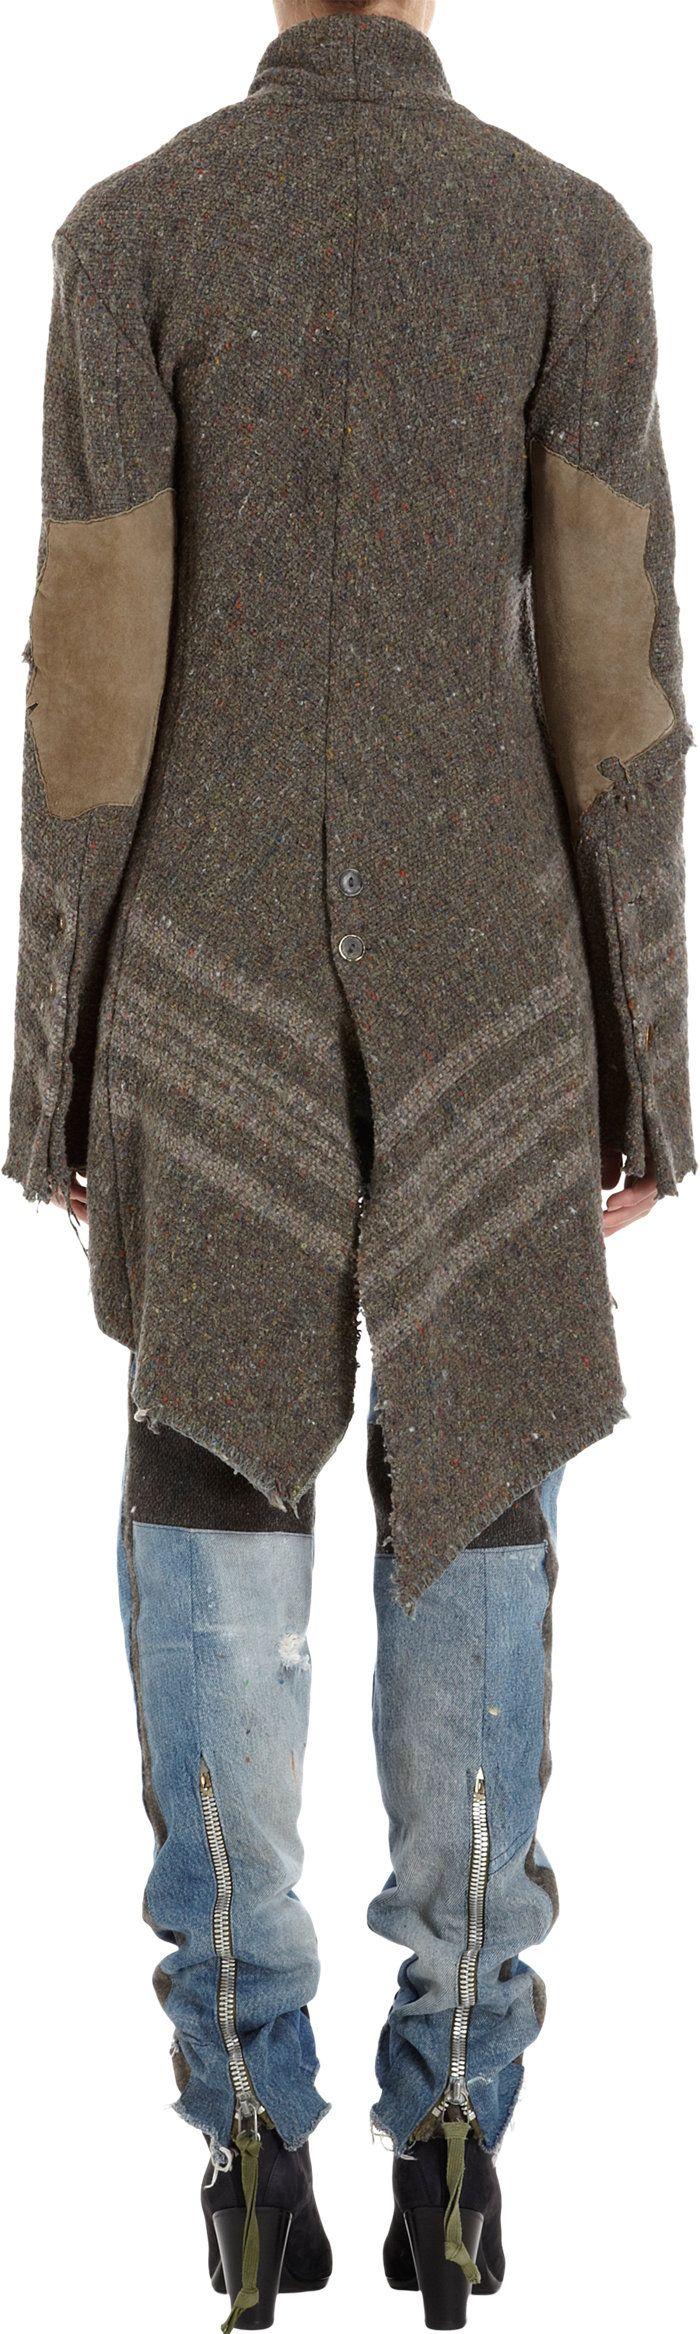 Blanket Modern Mozart Jacket